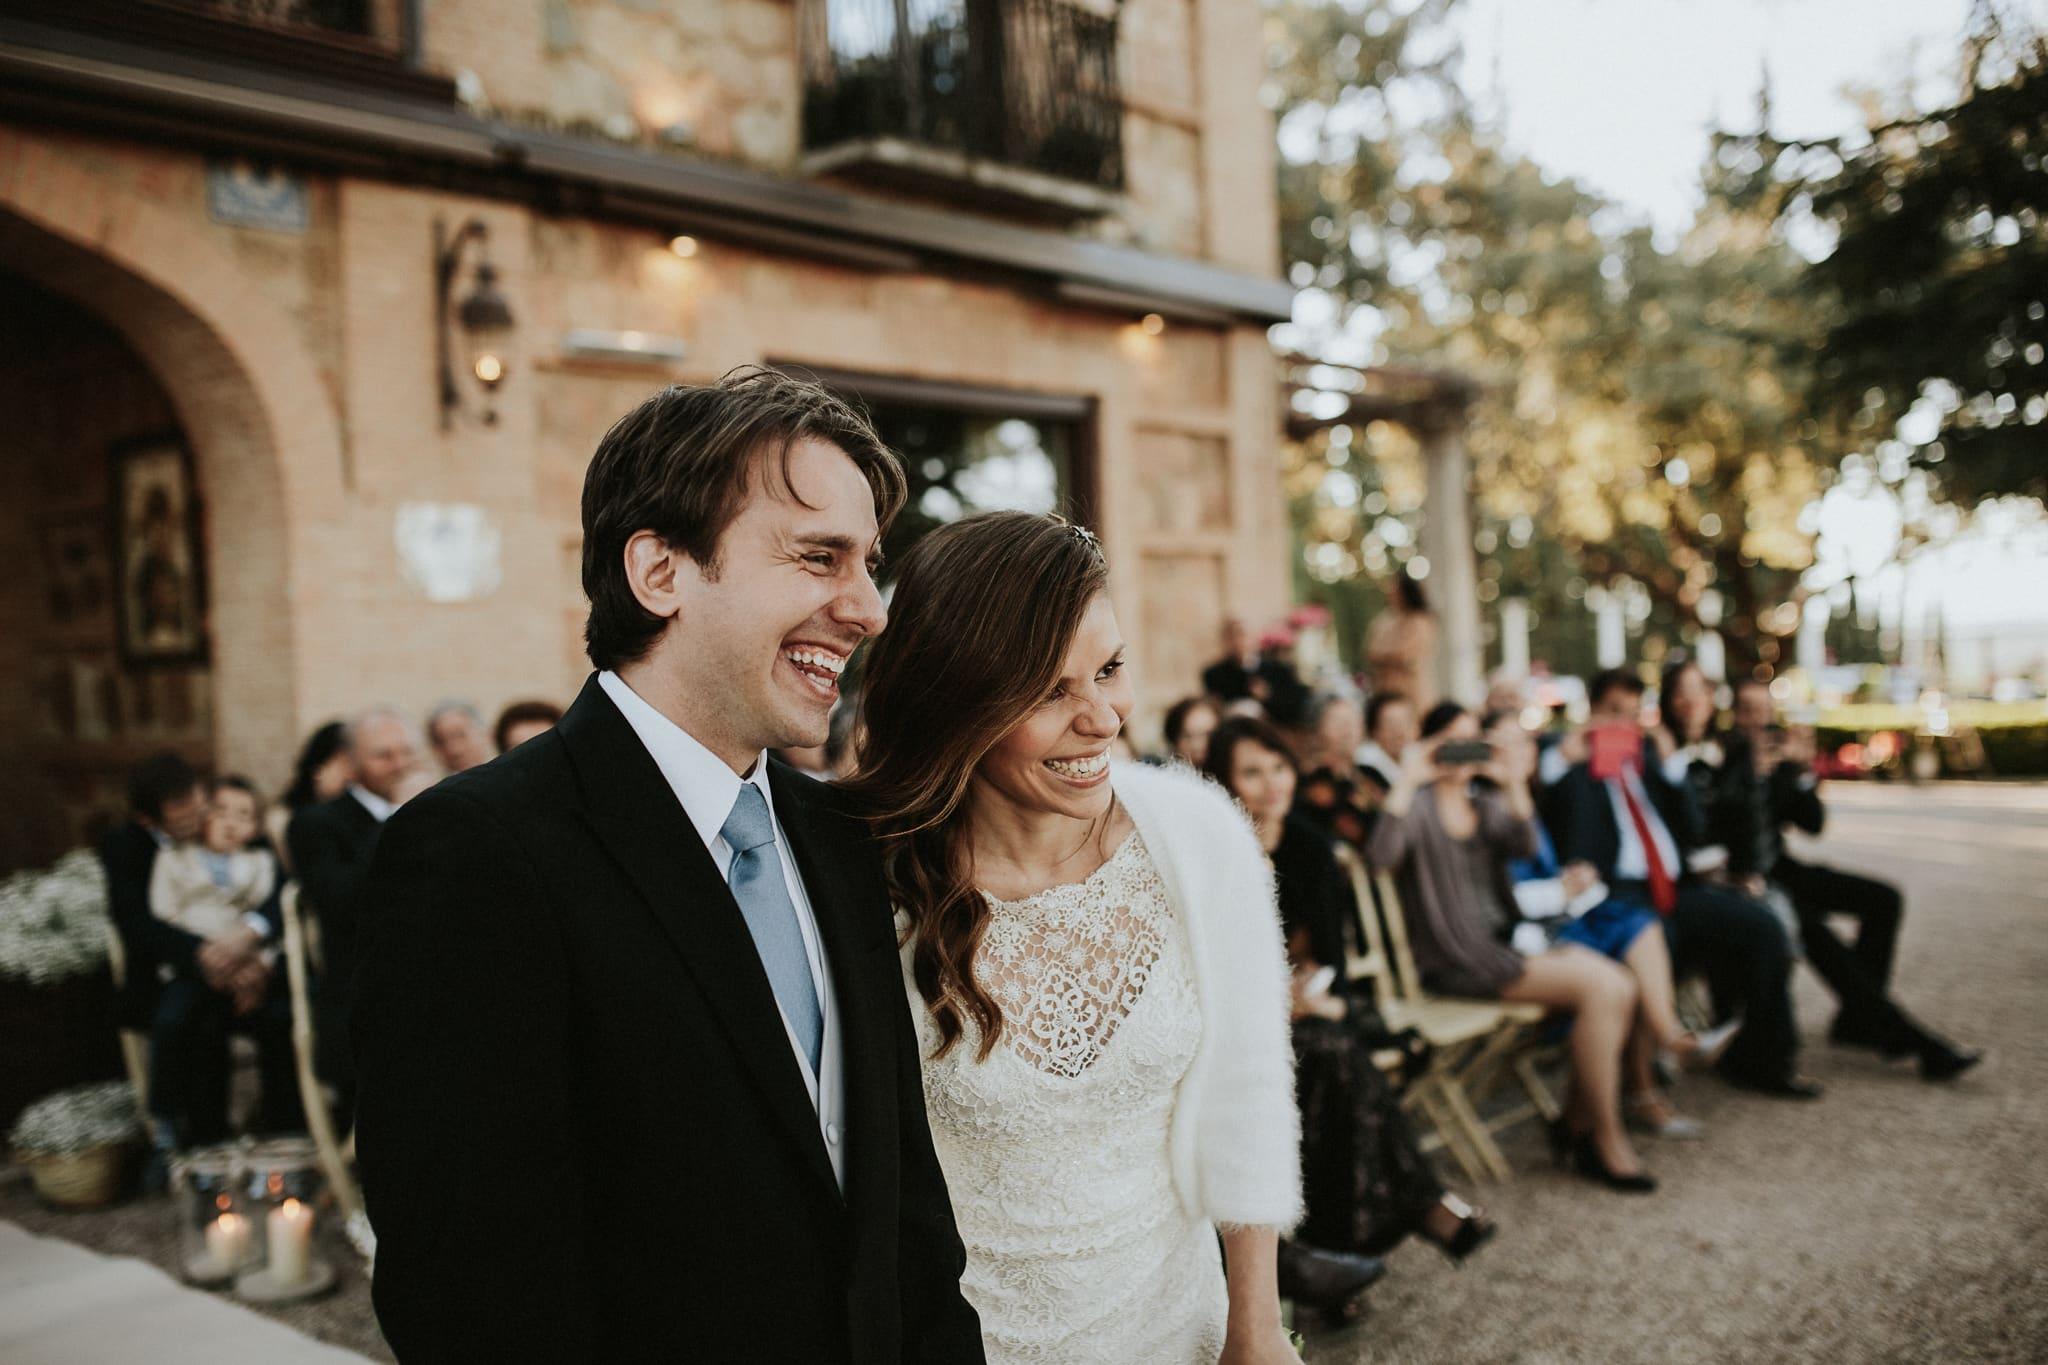 Fotografo-bodas-Cigarral-de-las-Mercedes-77